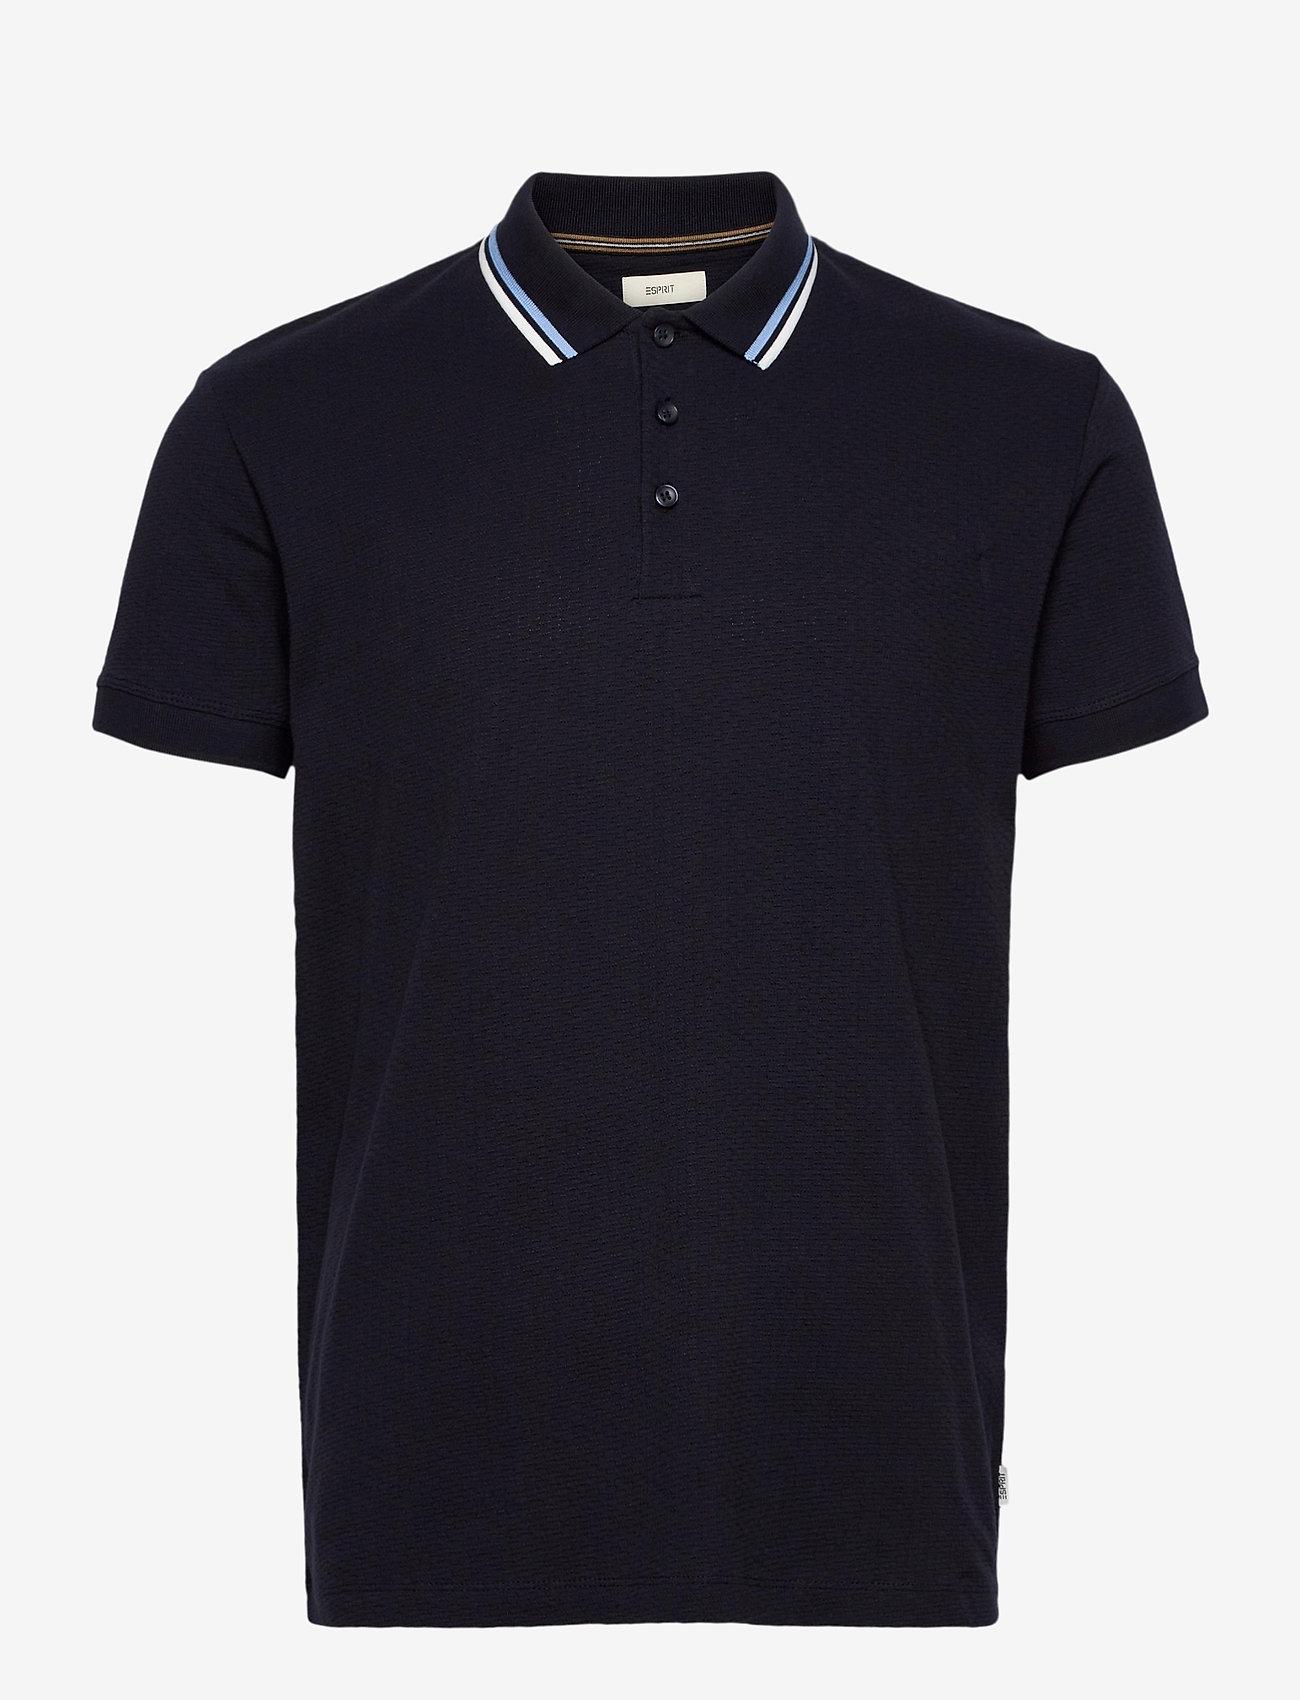 Esprit Casual - Polo shirts - t-shirts basiques - navy - 0